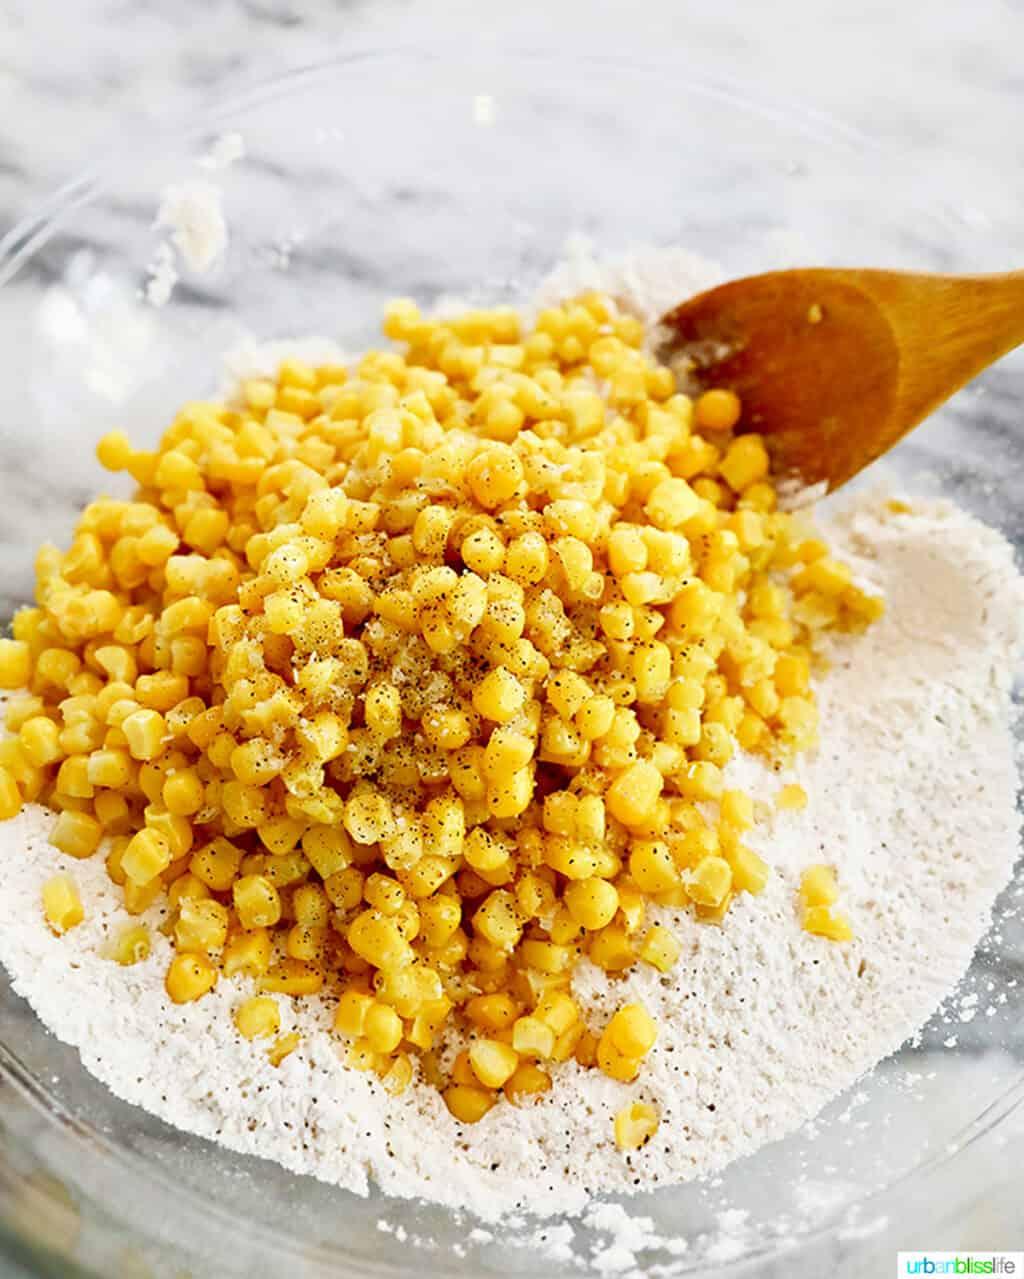 mixing corn into corn fritter batter